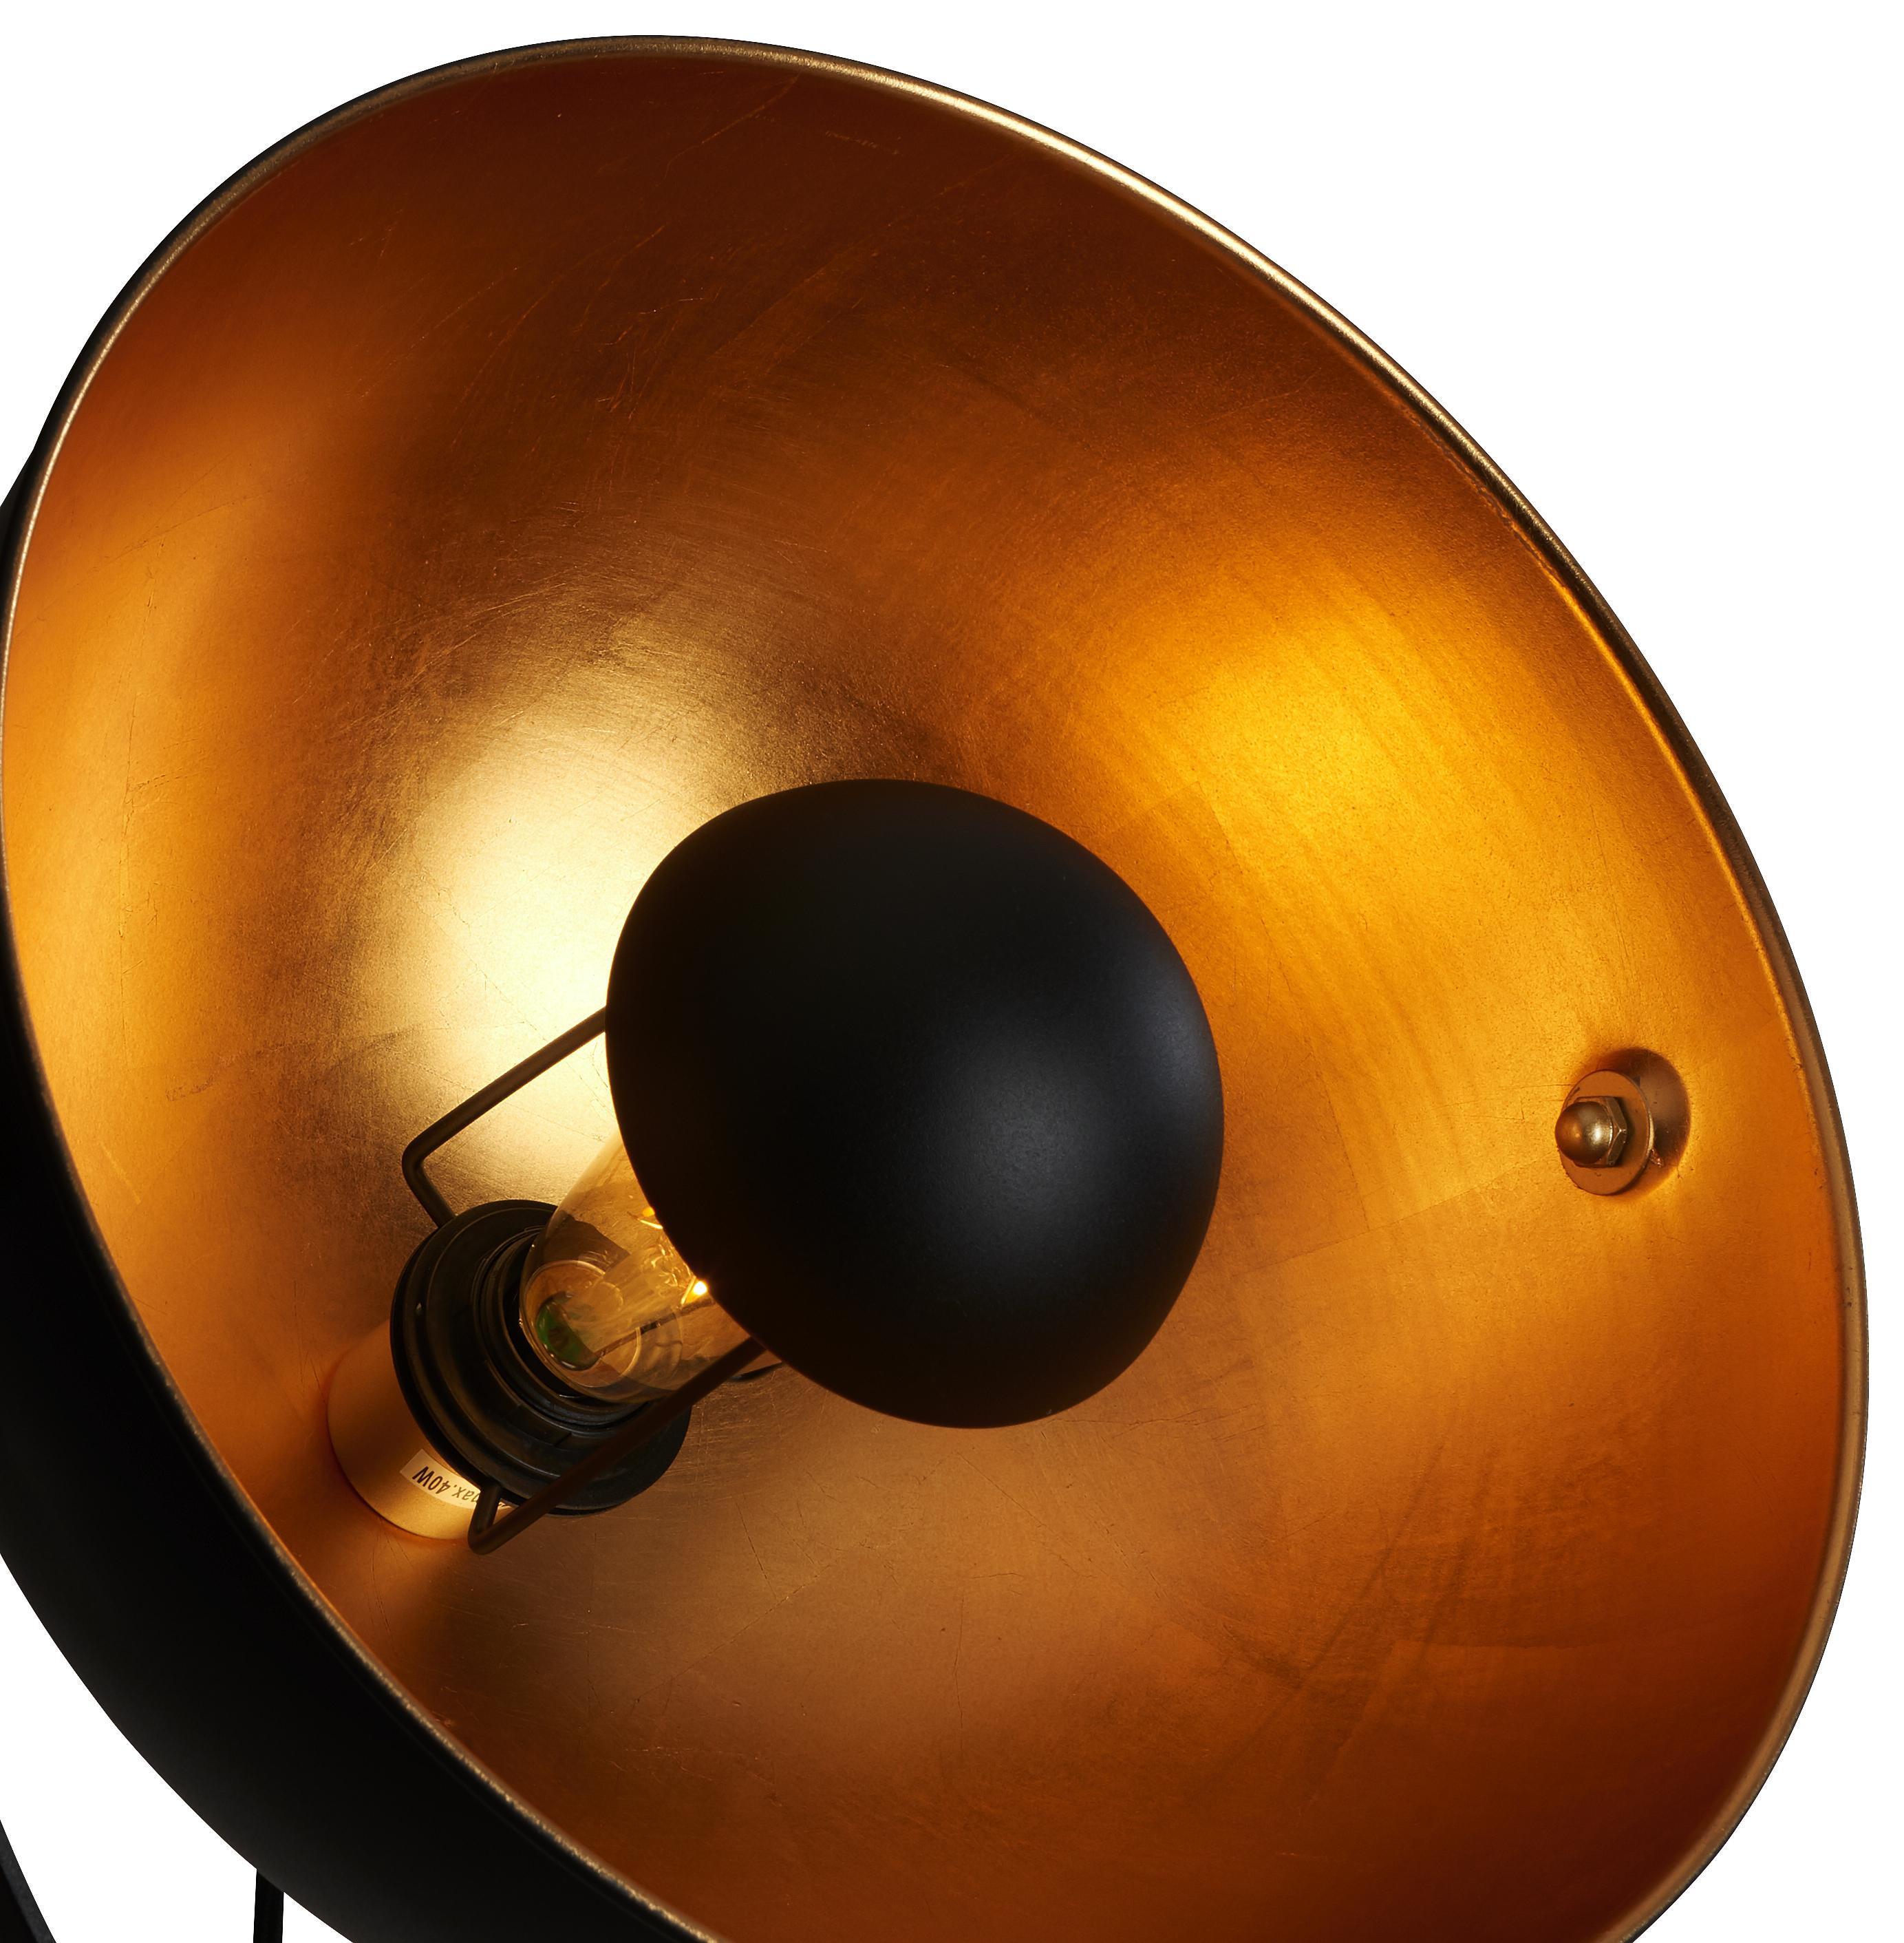 GOLVLAMPA - svart/guldfärgad, Trend, metall (40/168cm)